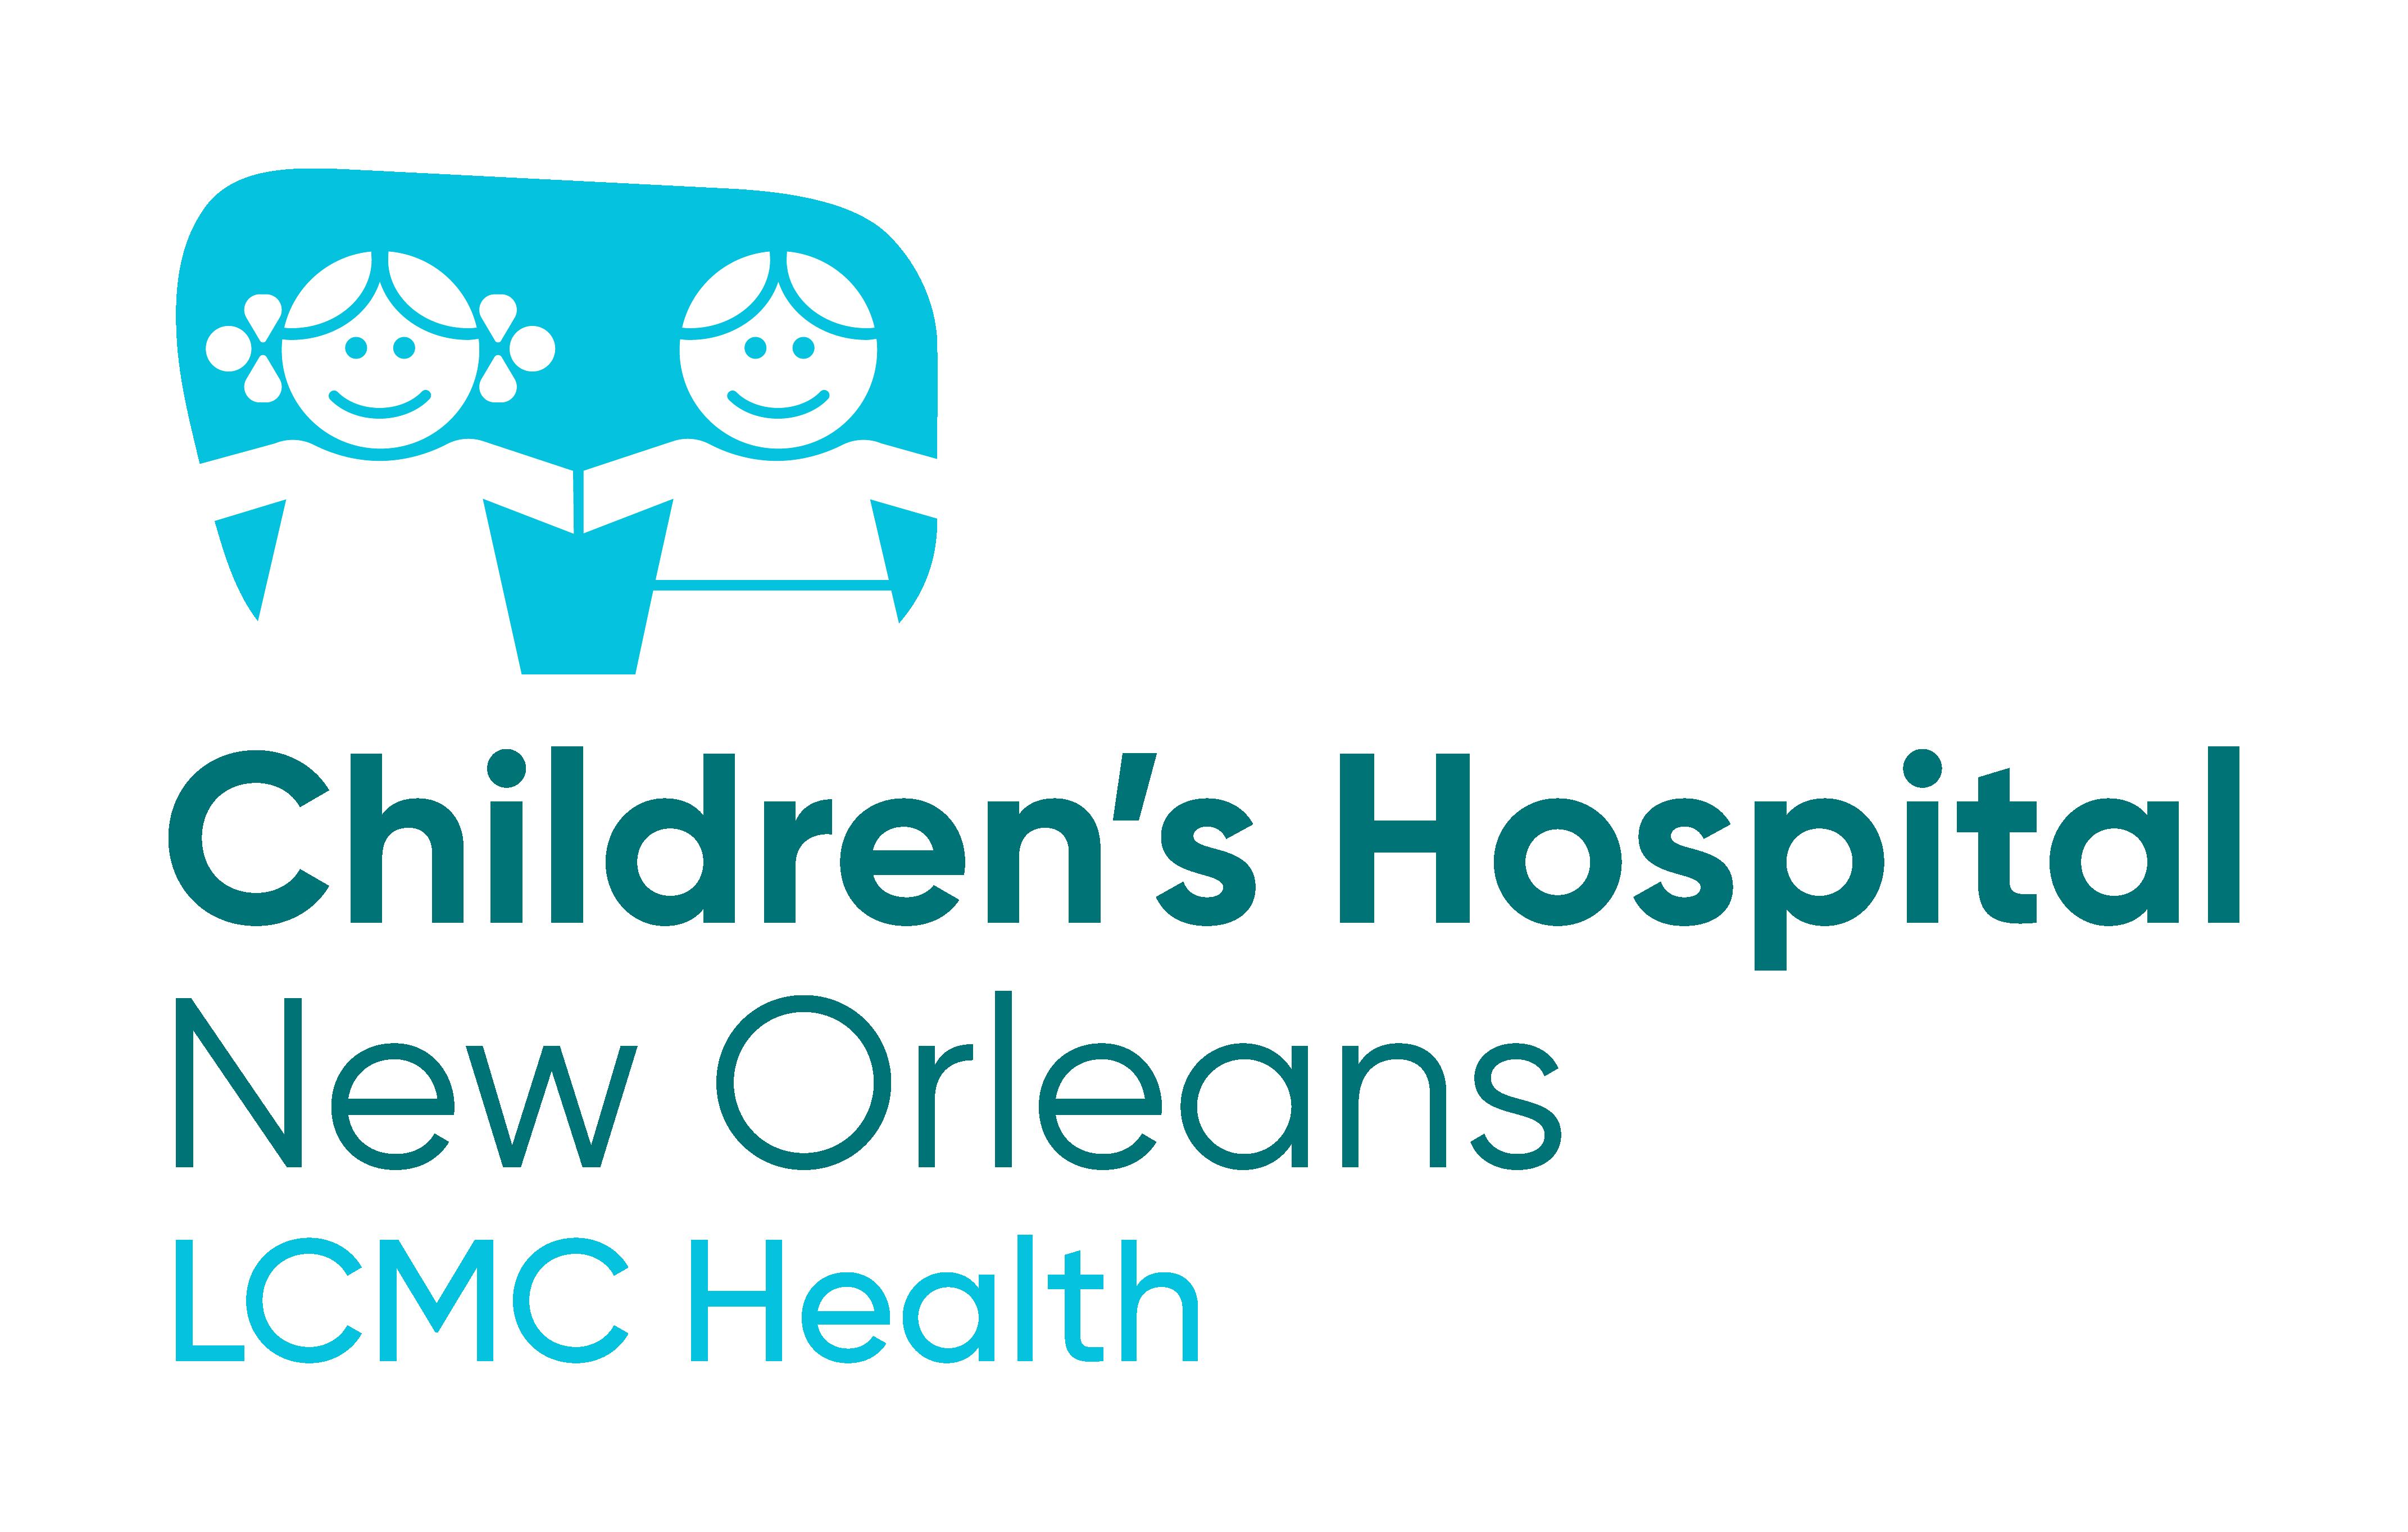 LCMC Health- Children's Hospital New Orleans logo